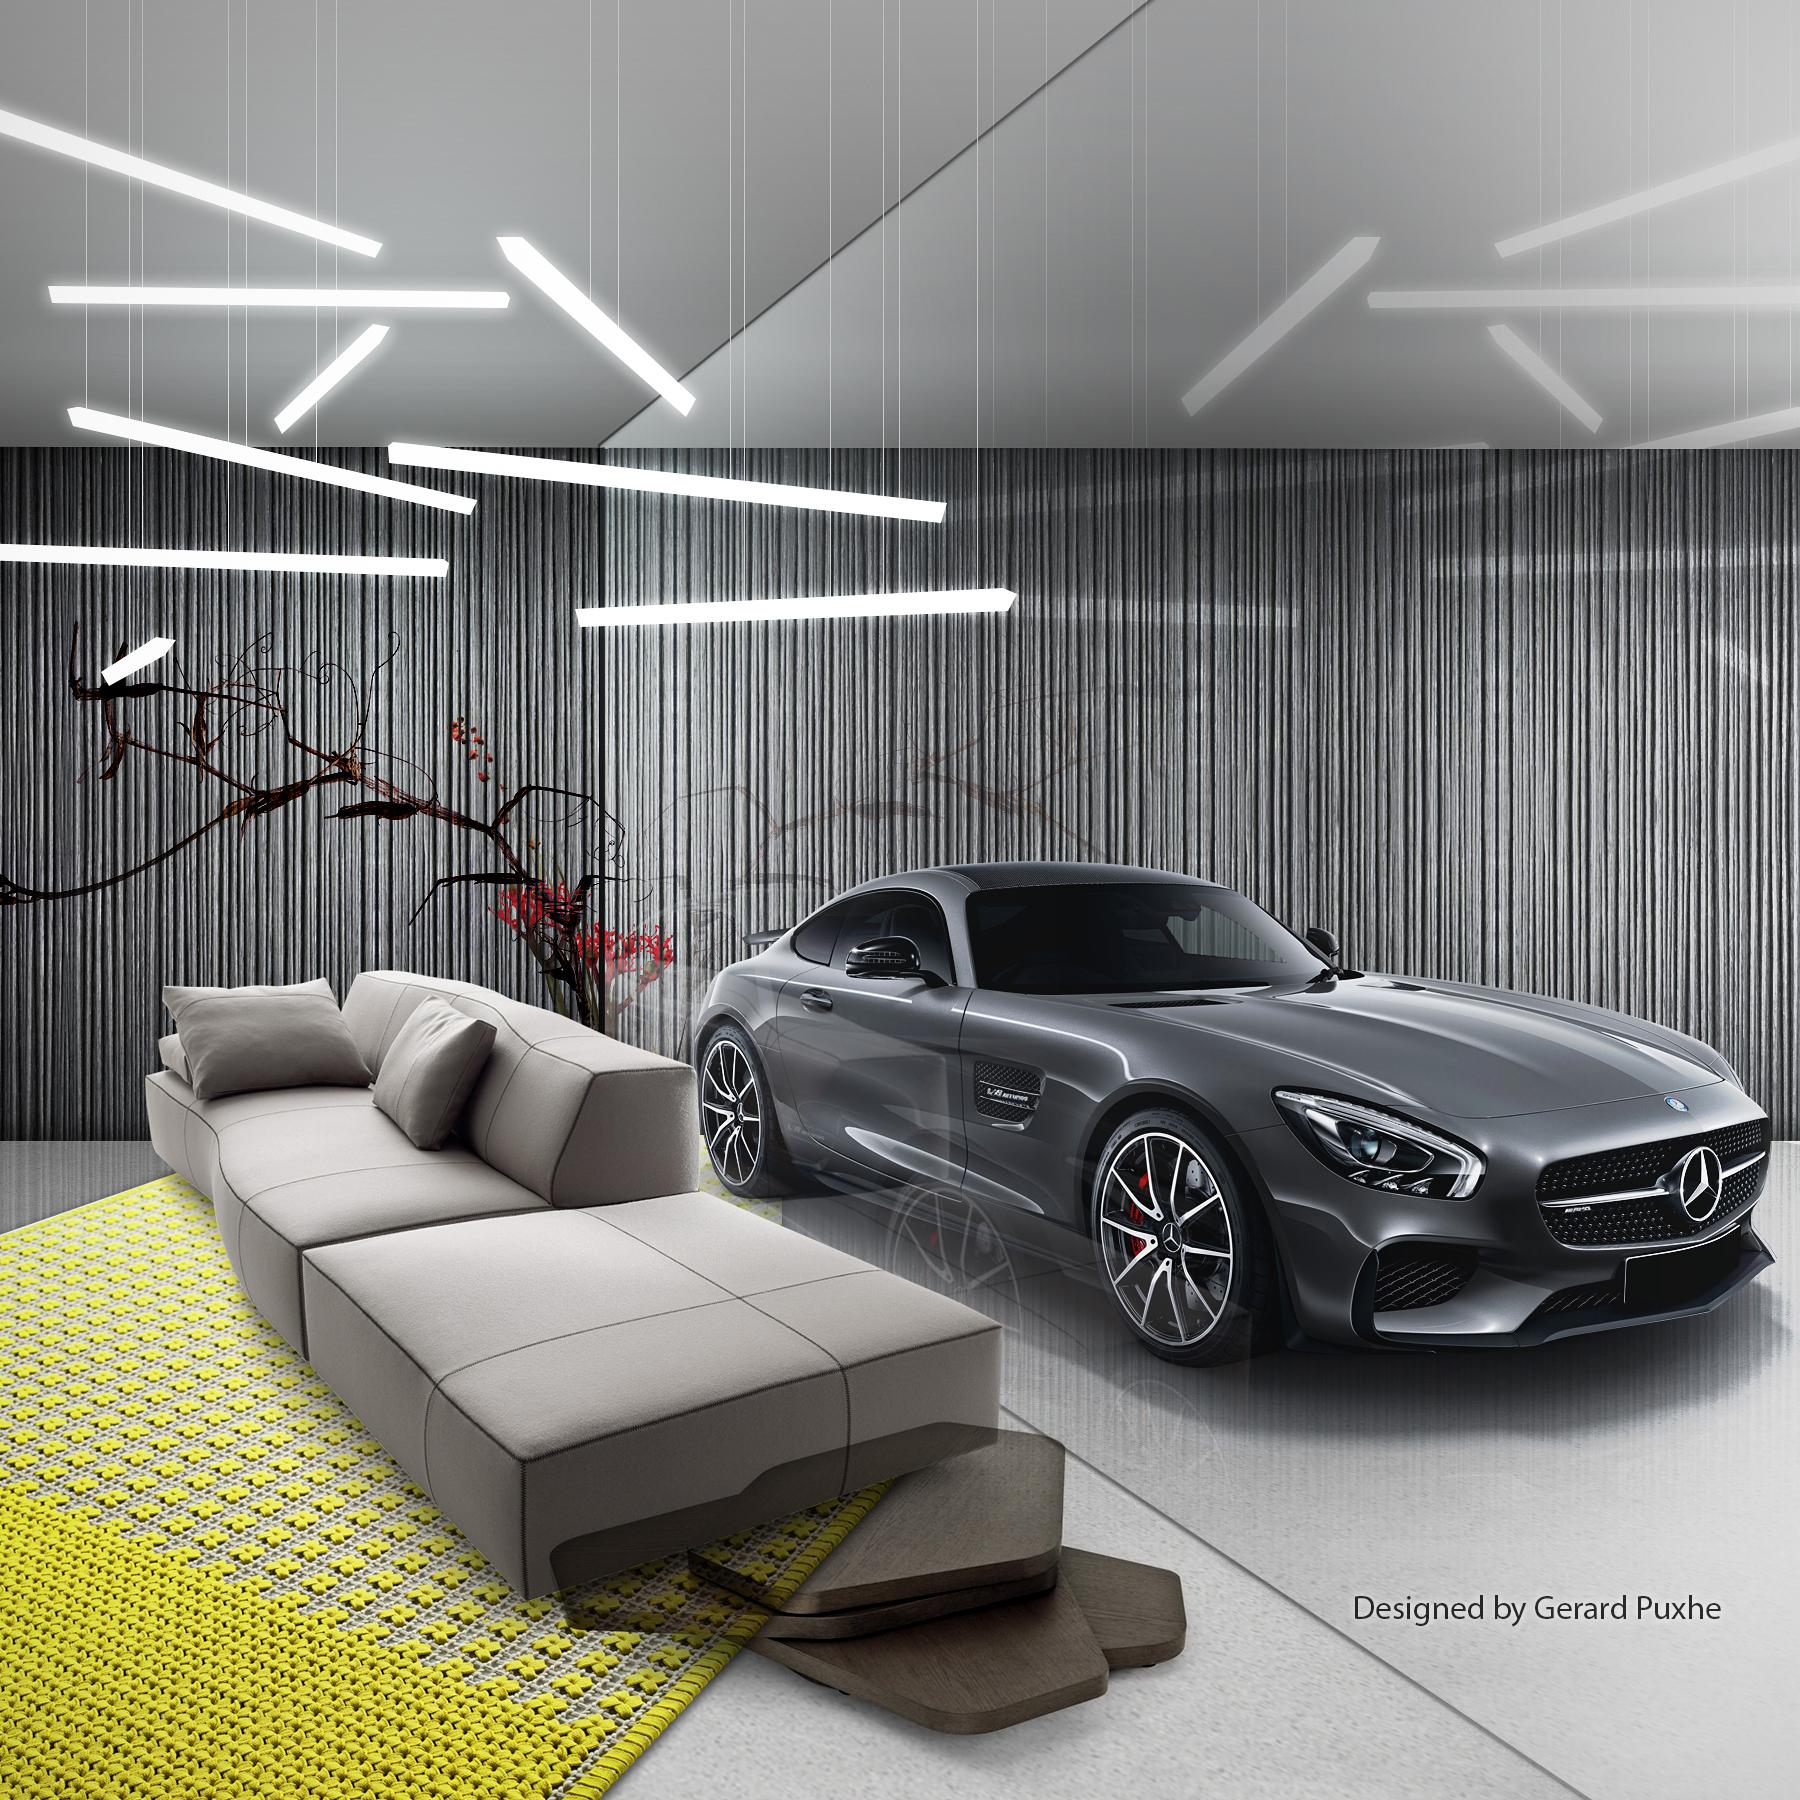 Trophies - Interior design by Gerard Puxhe